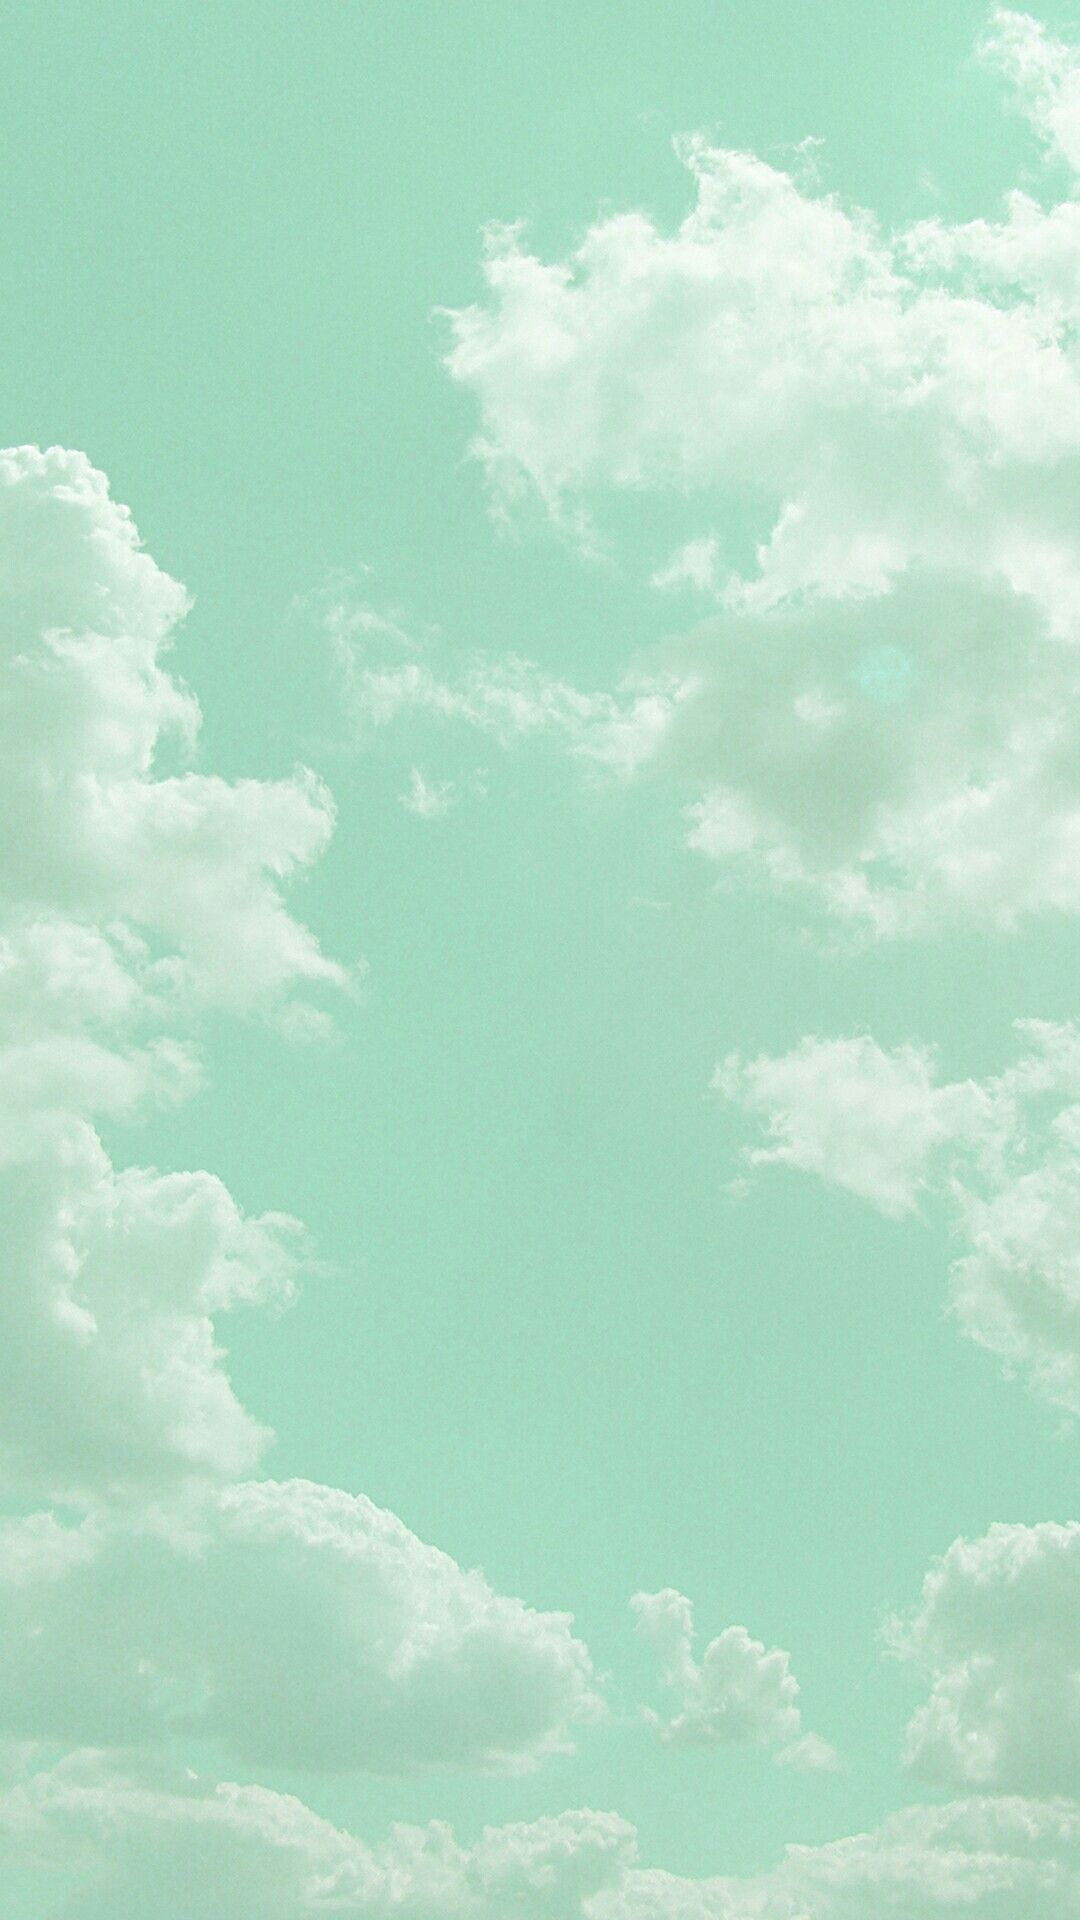 Estetica Purpura Y Verde De Fondo De Pantalla Android Descargar Mint Green Aesthetic Green Wallpaper Green Aesthetic